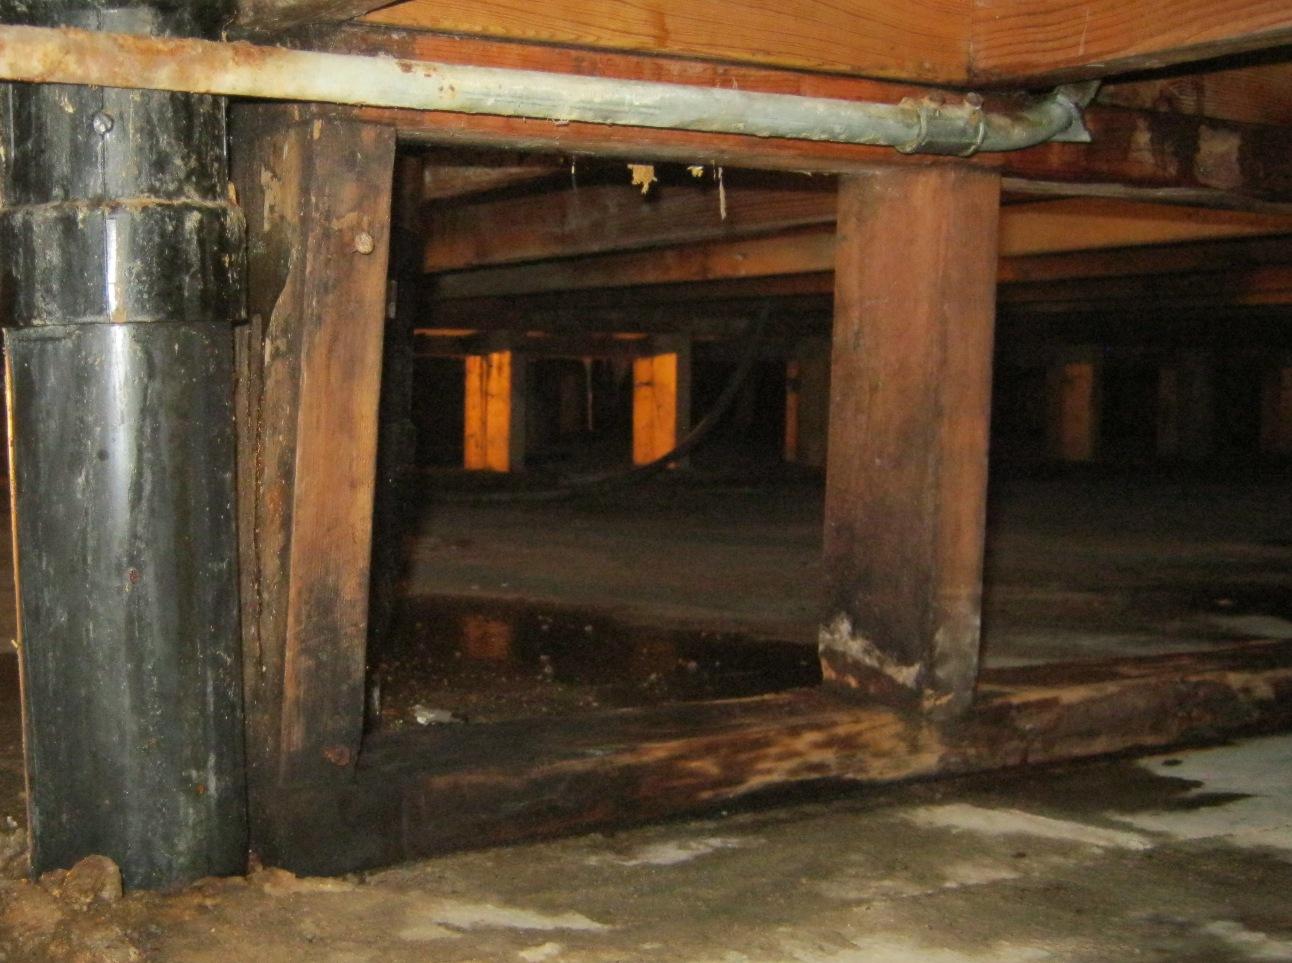 Mold crawlspace damp